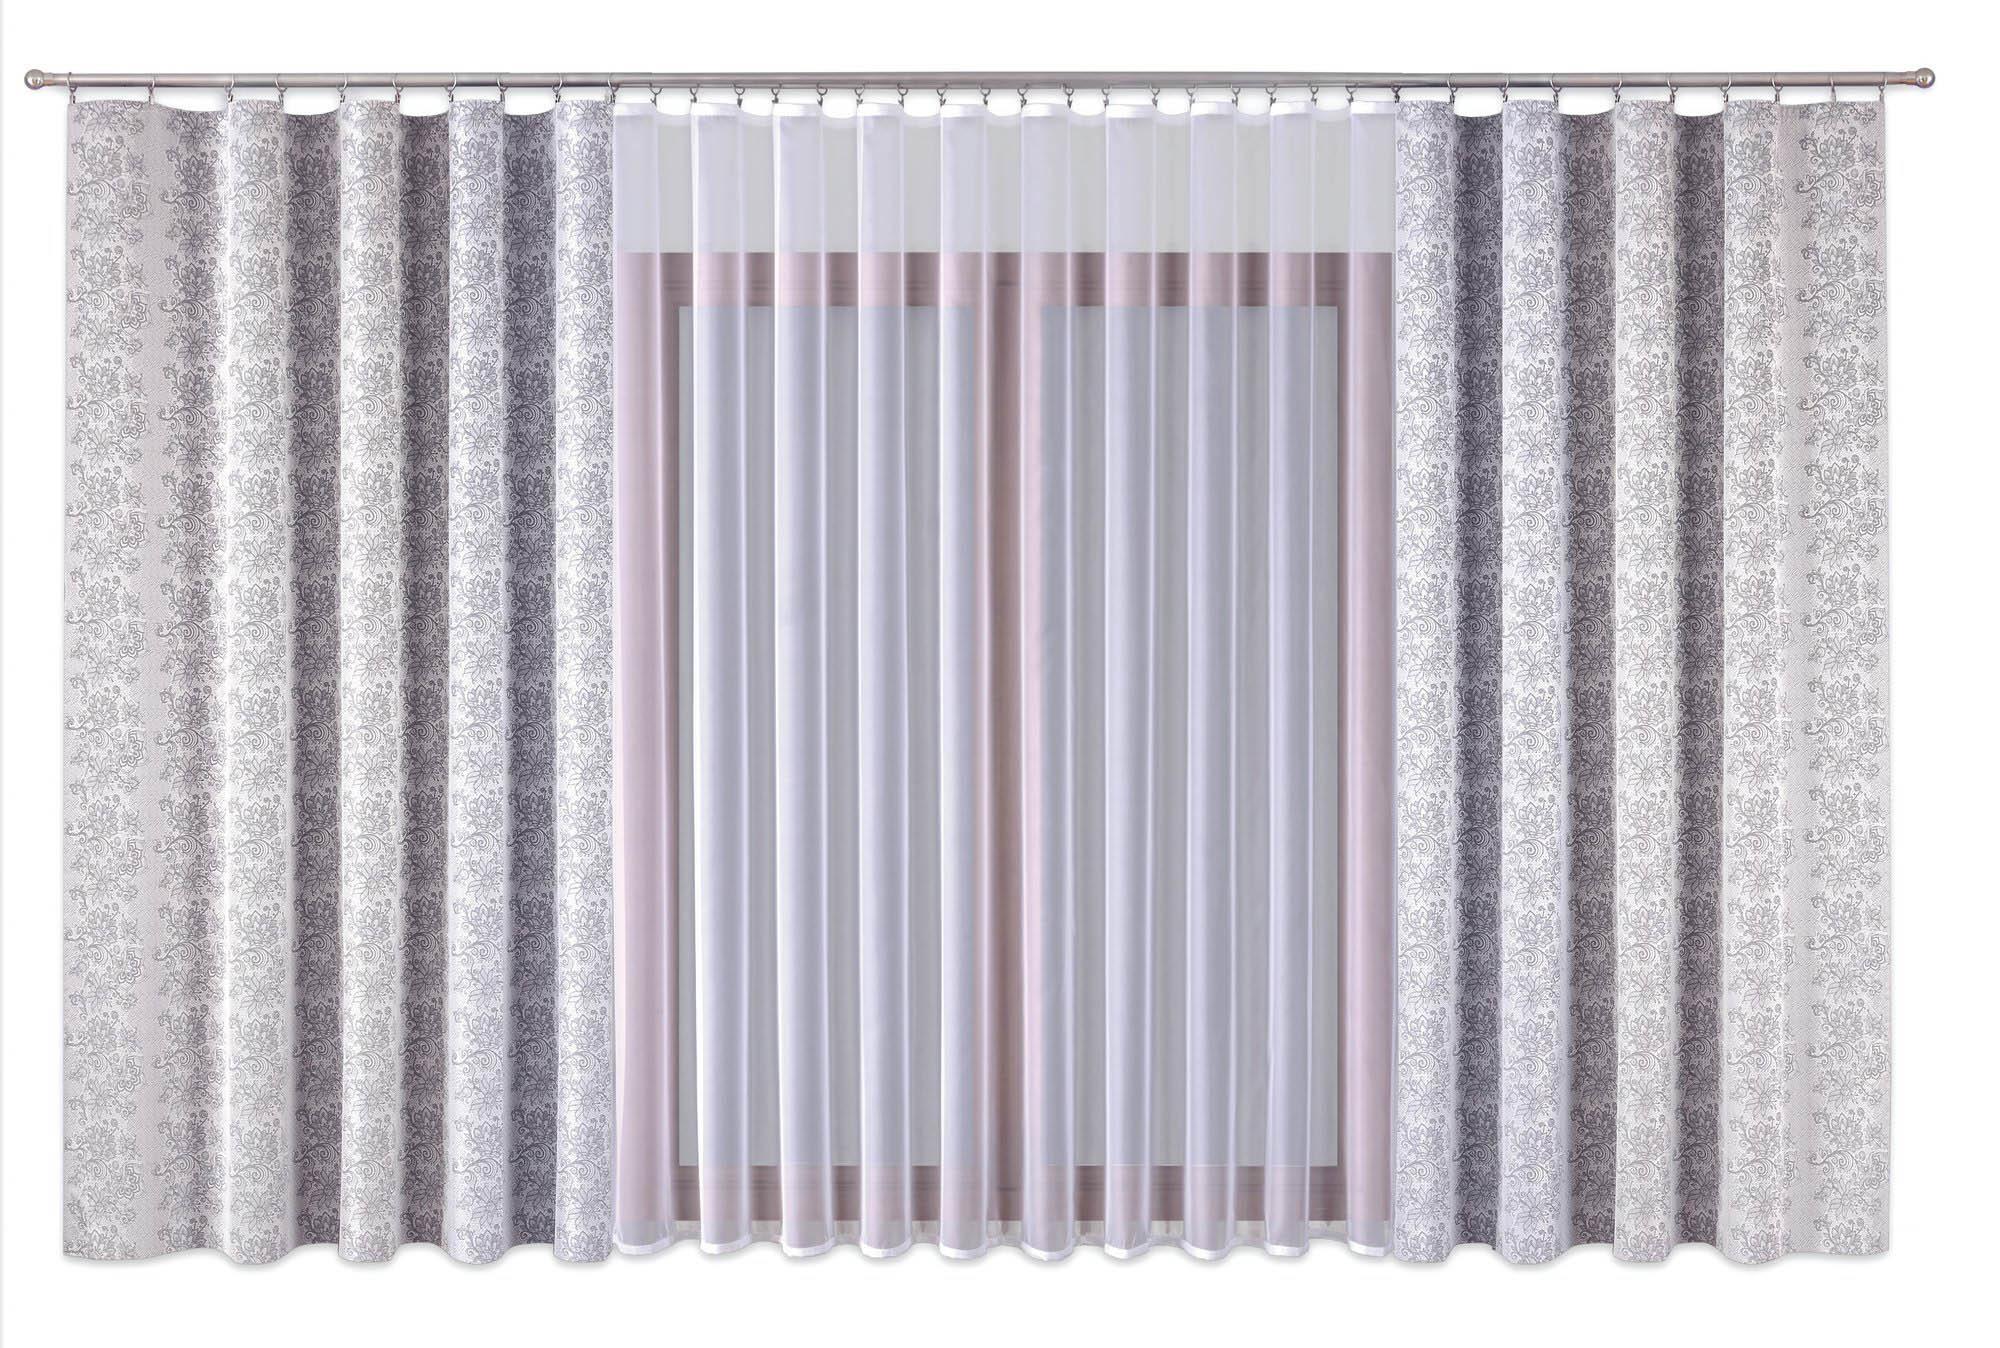 Шторы Primavera Классические шторы Natalie Цвет: Серый шторы primavera классические шторы tilly цвет серый